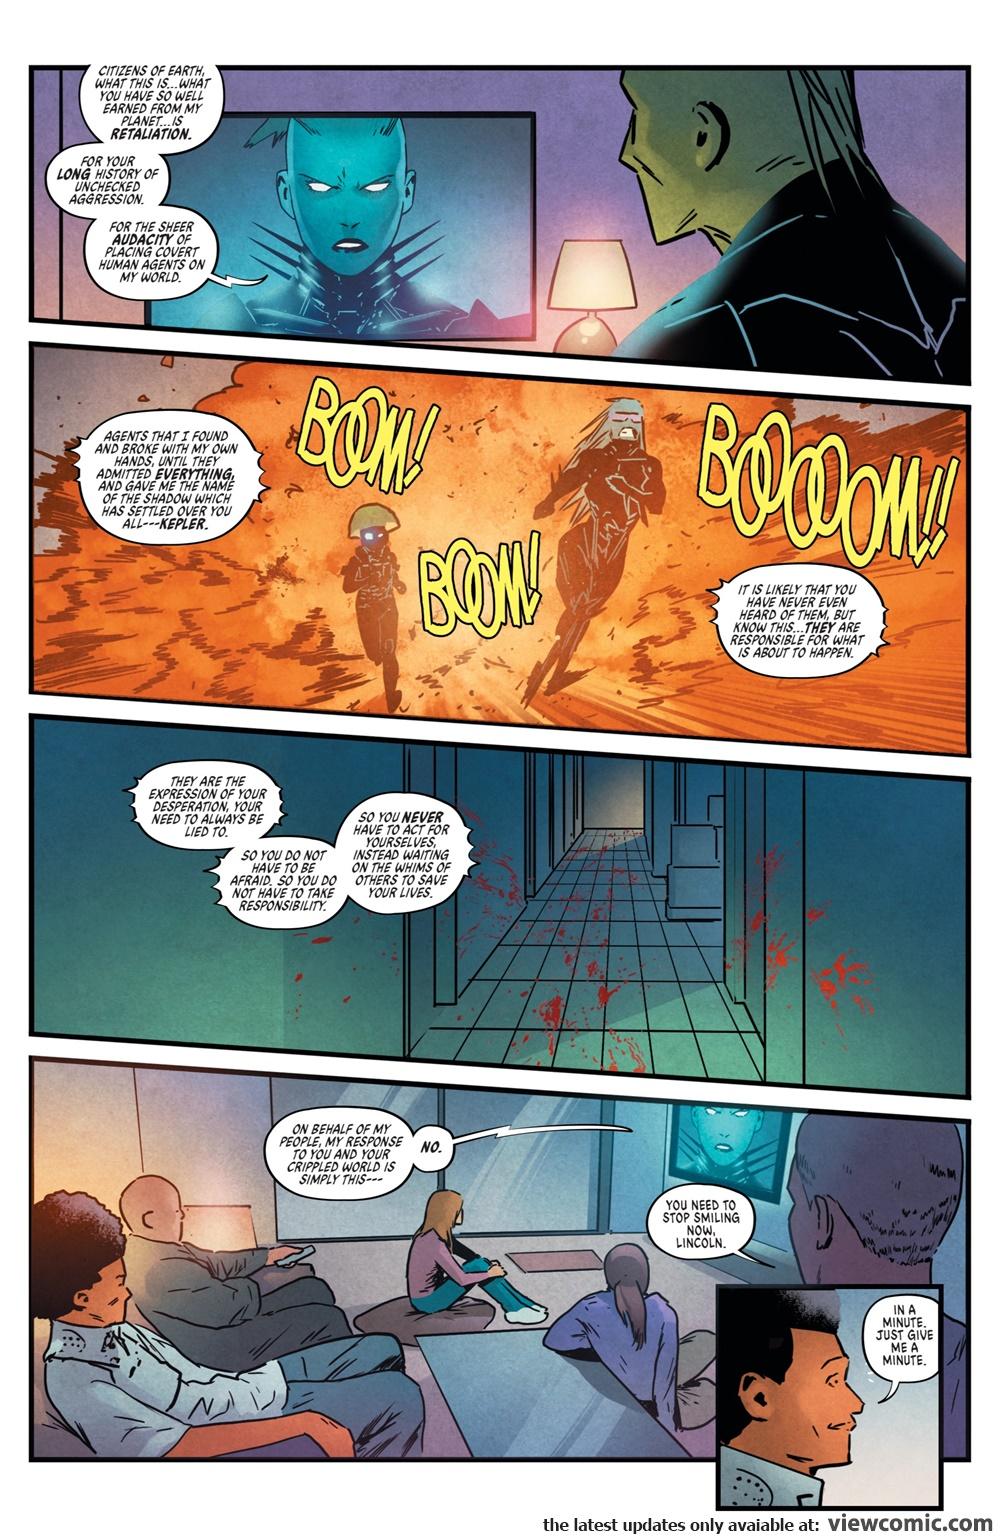 Horizon 012 (2017) | Vietcomic.net reading comics online for free